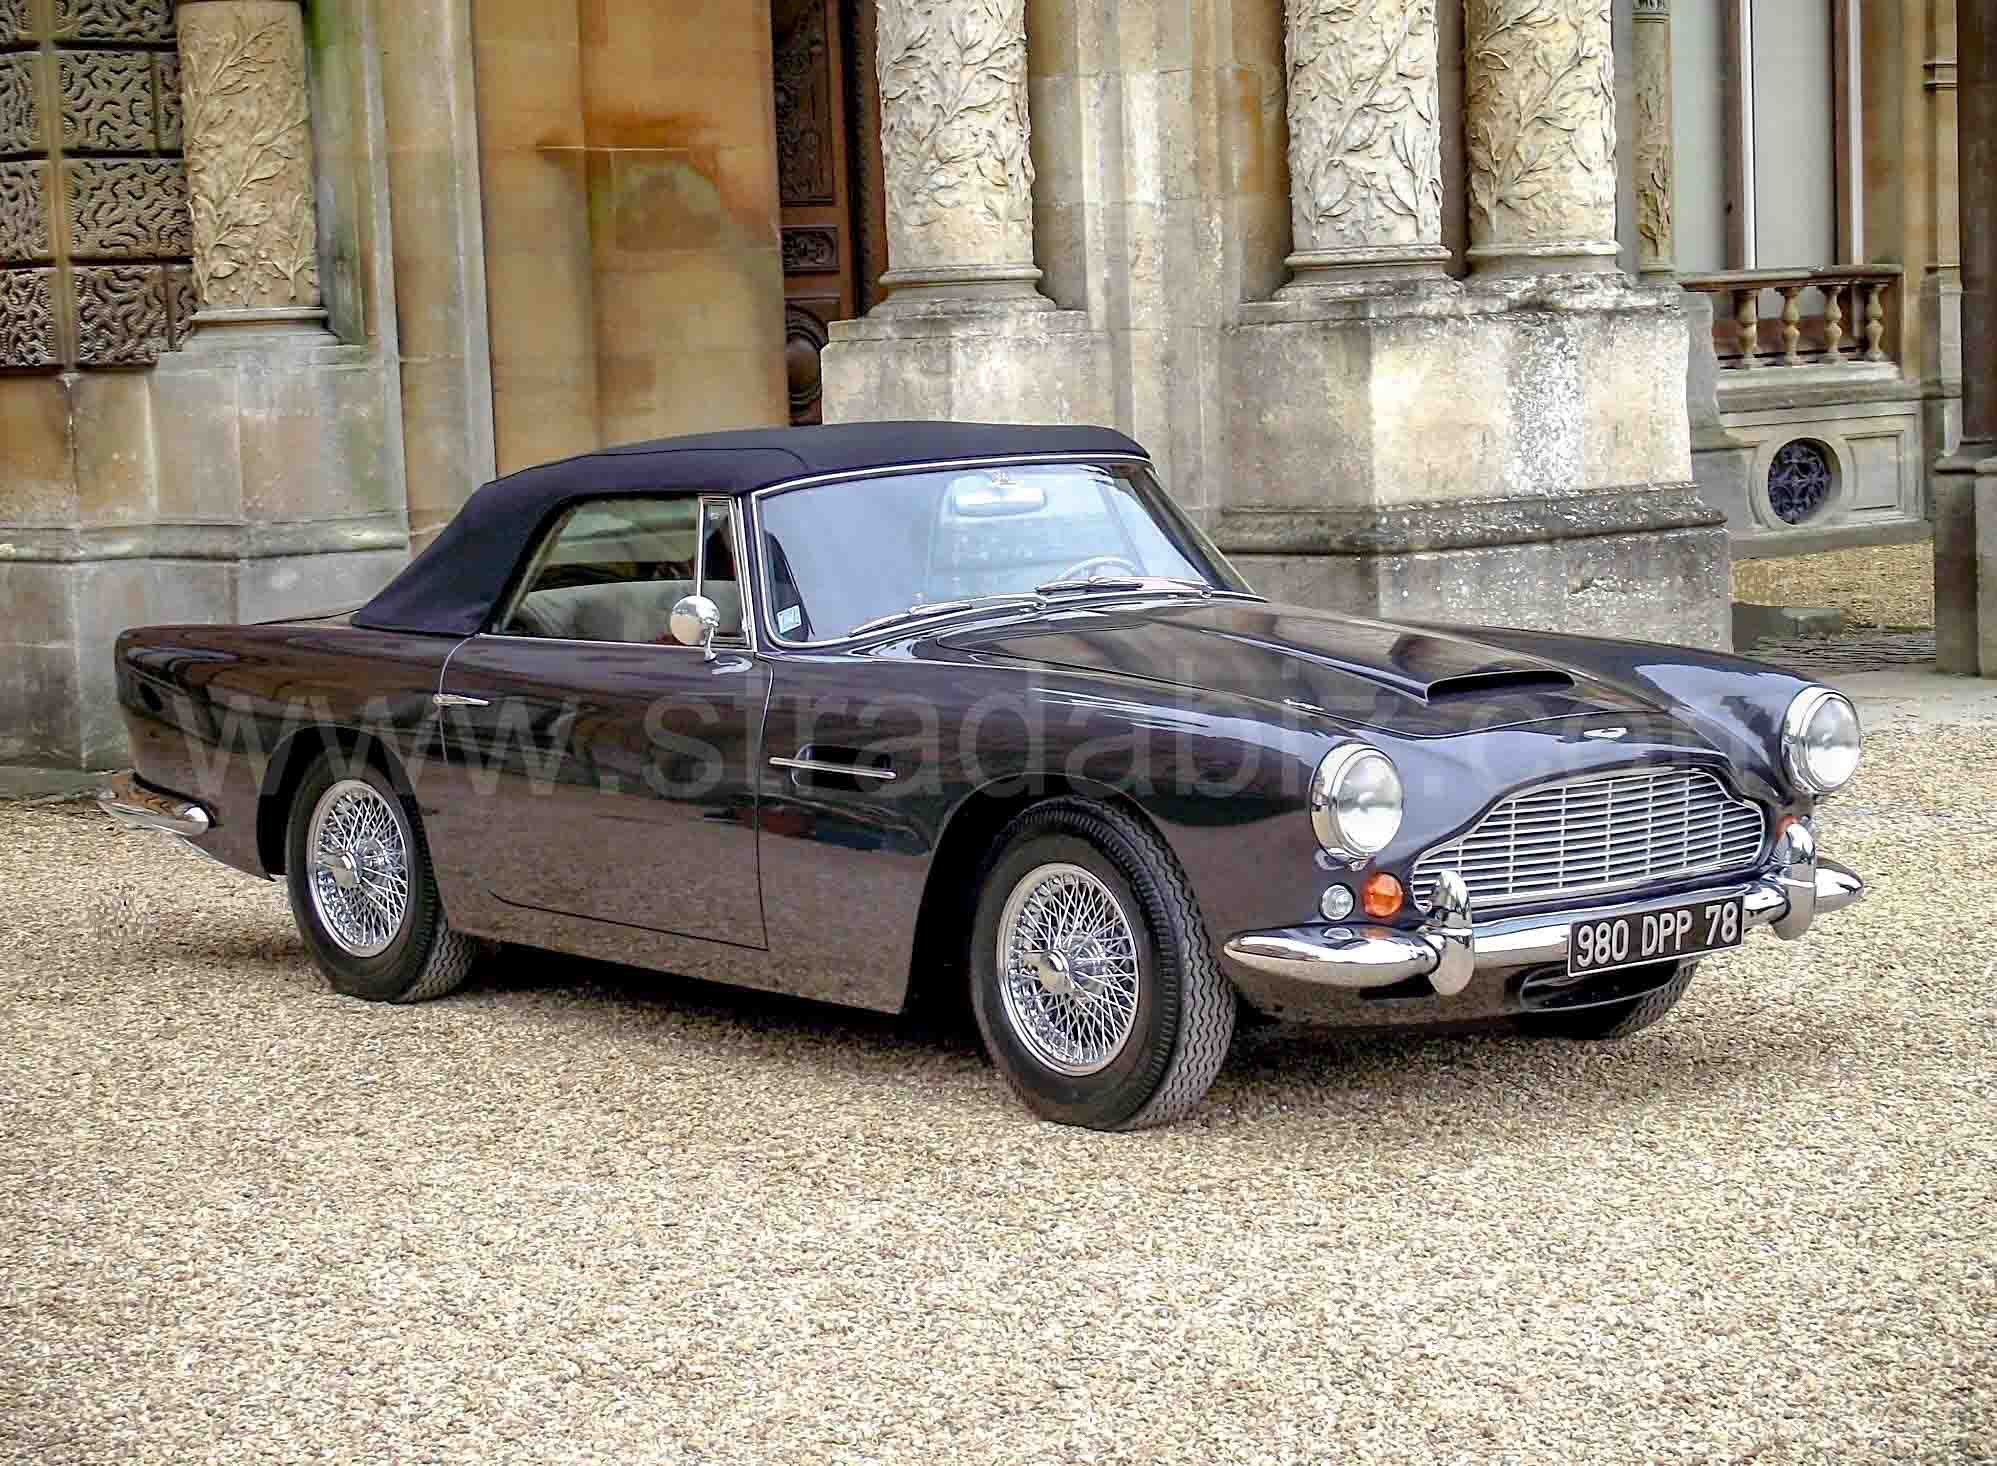 Aston Martin Db4 Convertible Stradabiz